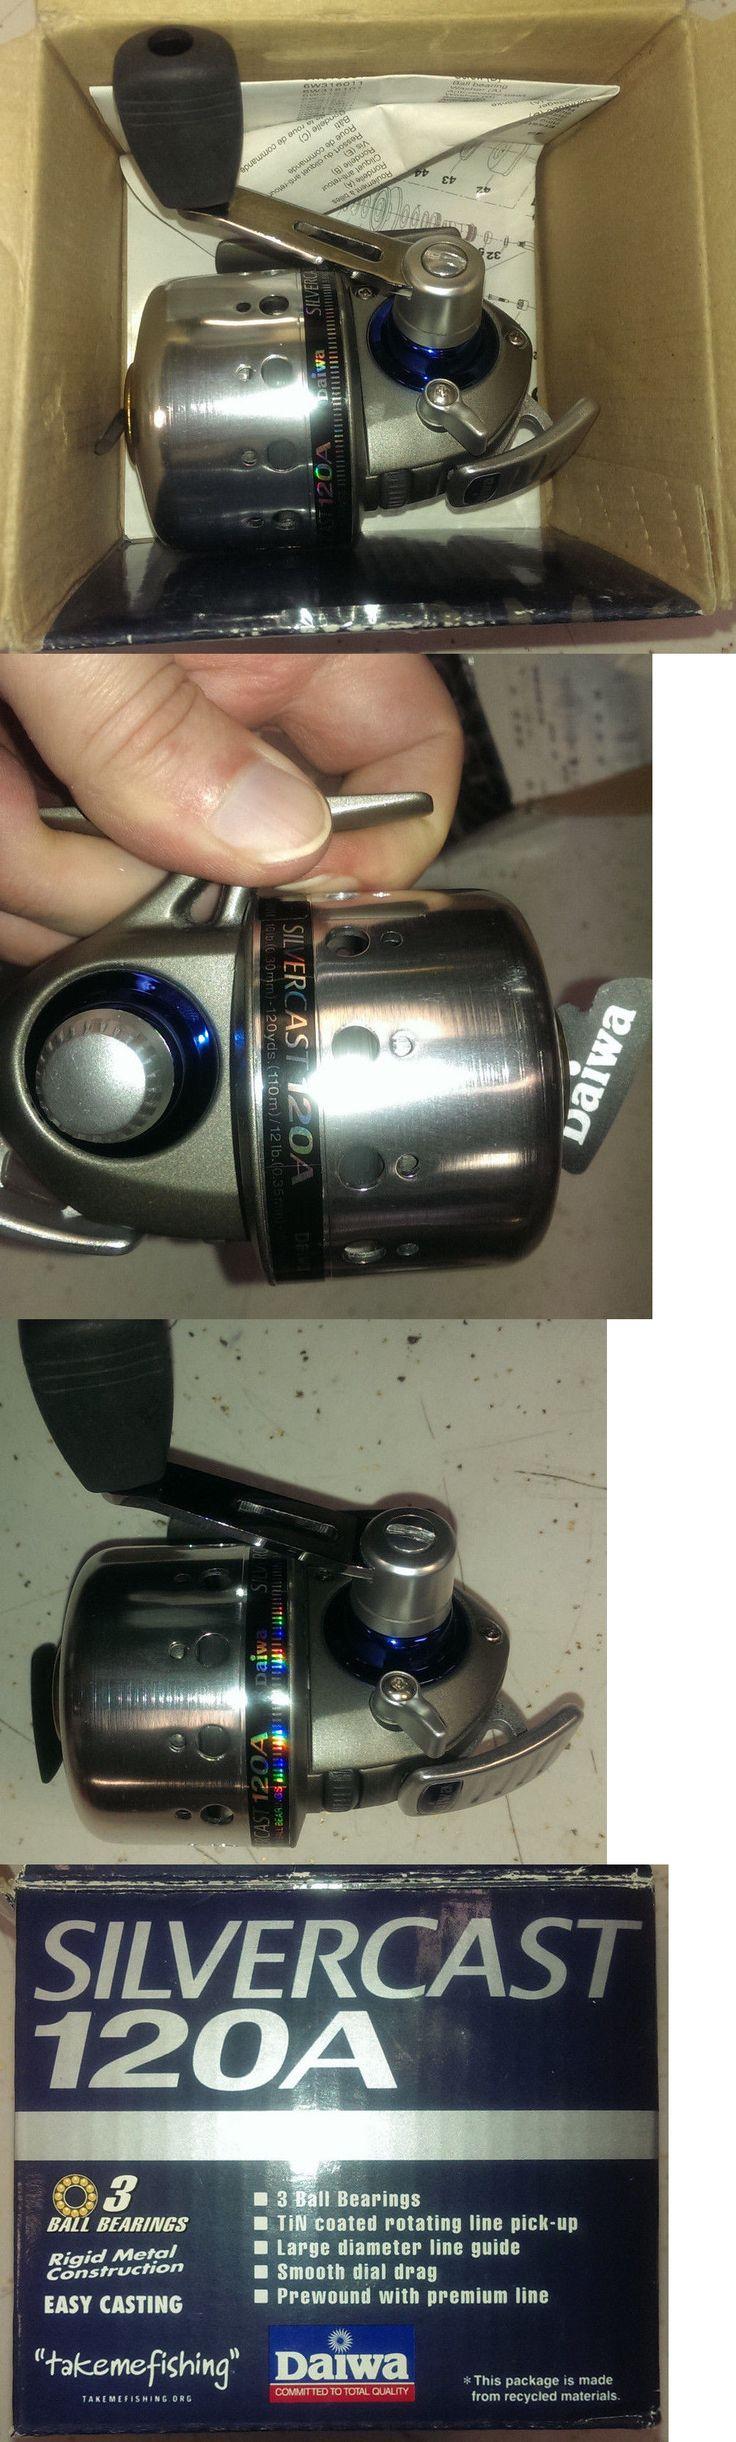 Spincasting Reels 108154: Daiwa Silvercast 120A Series Spincast Reel Fishing Reel 3 Bb 4.3:1 Gr -> BUY IT NOW ONLY: $33.33 on eBay!